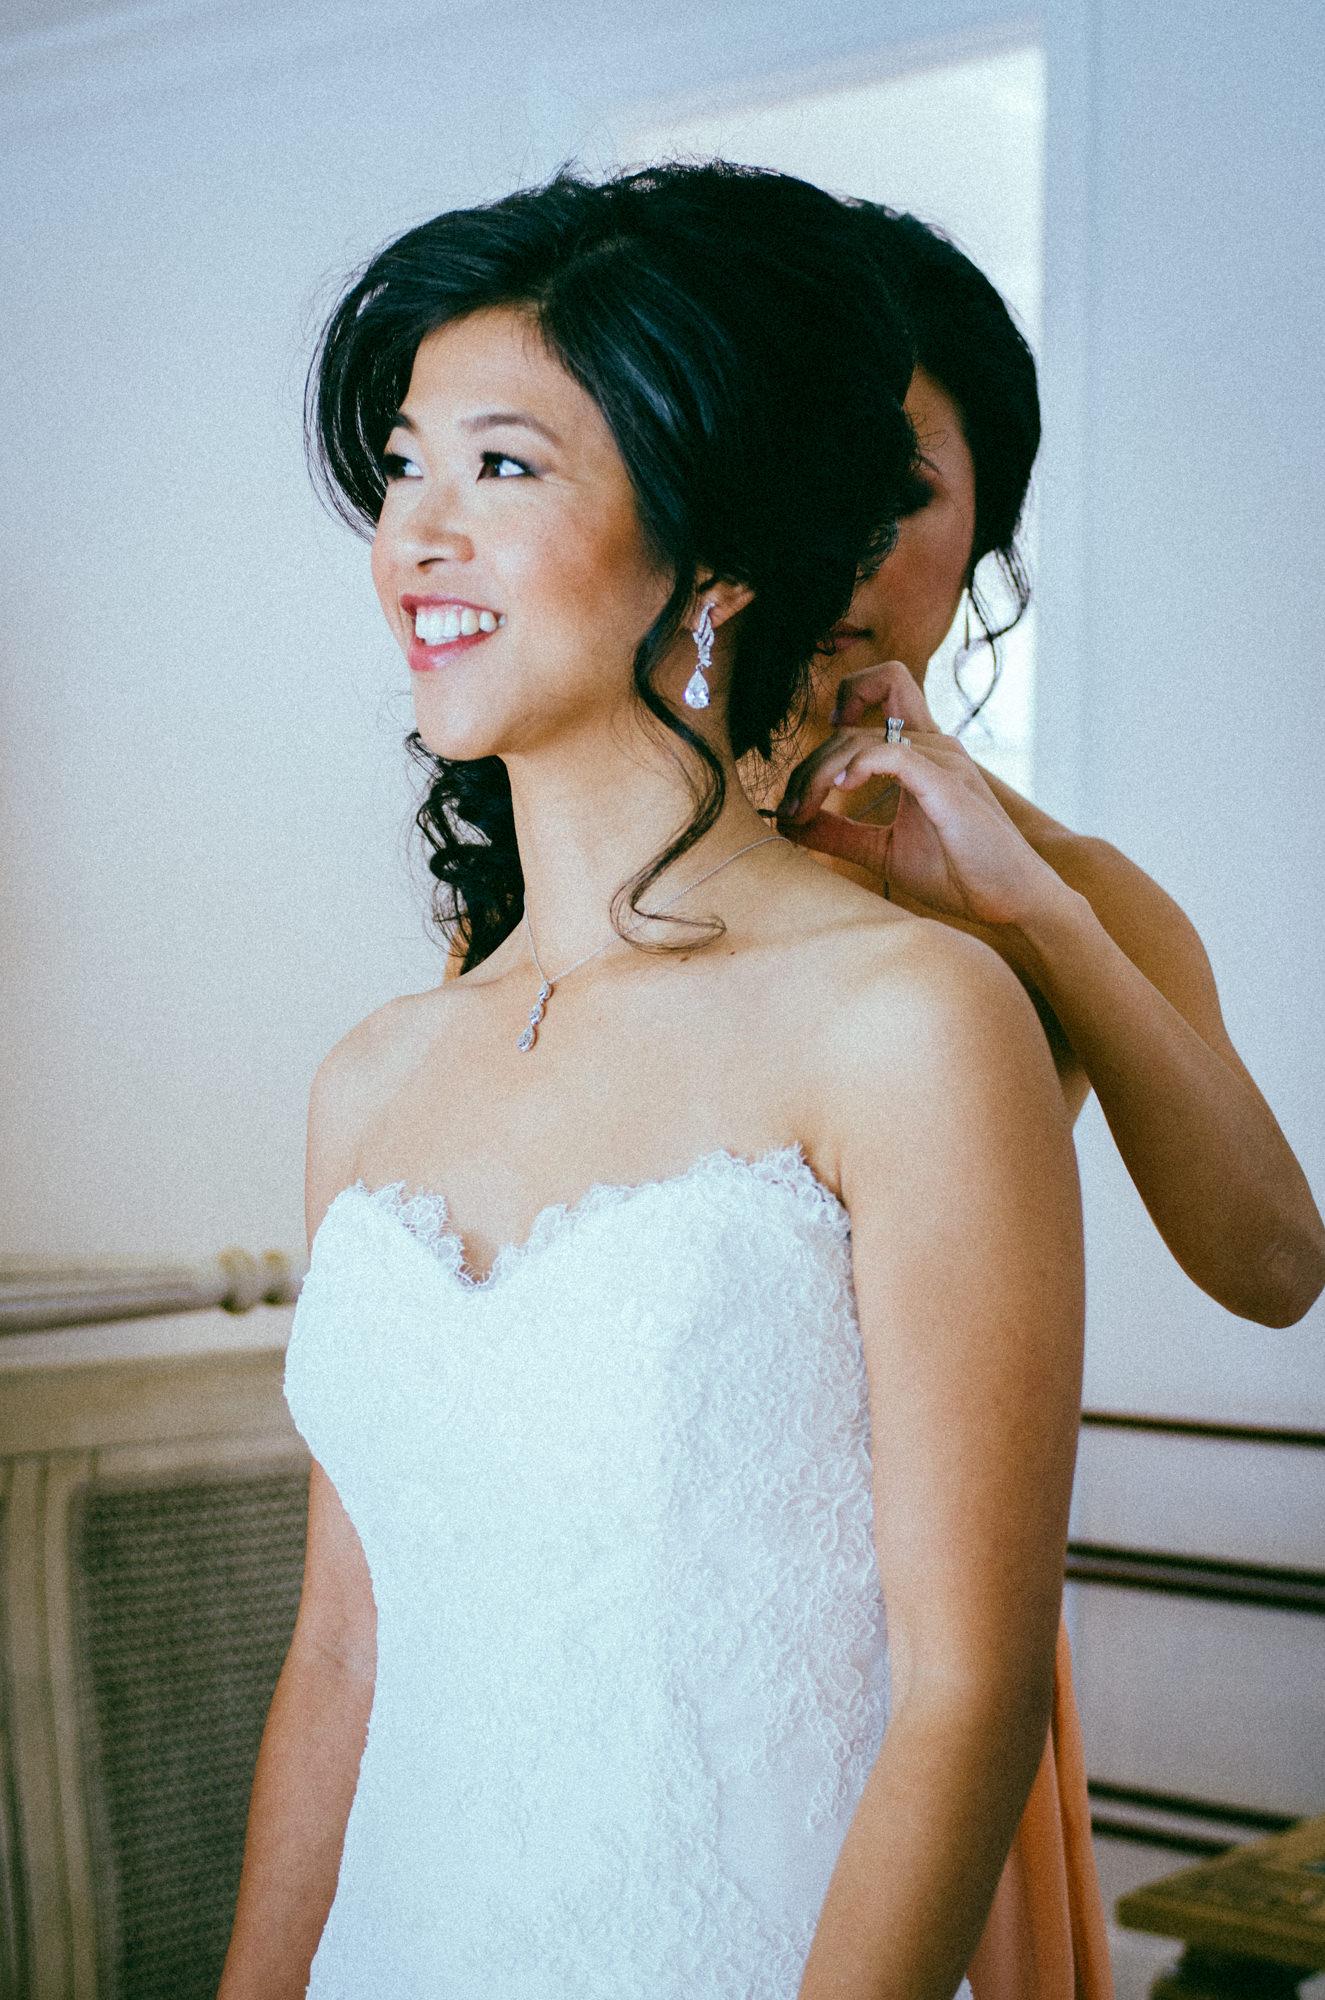 Alice_&_Aaron_Wedding_by_The_Light_&_Glass_Photography-026.jpg